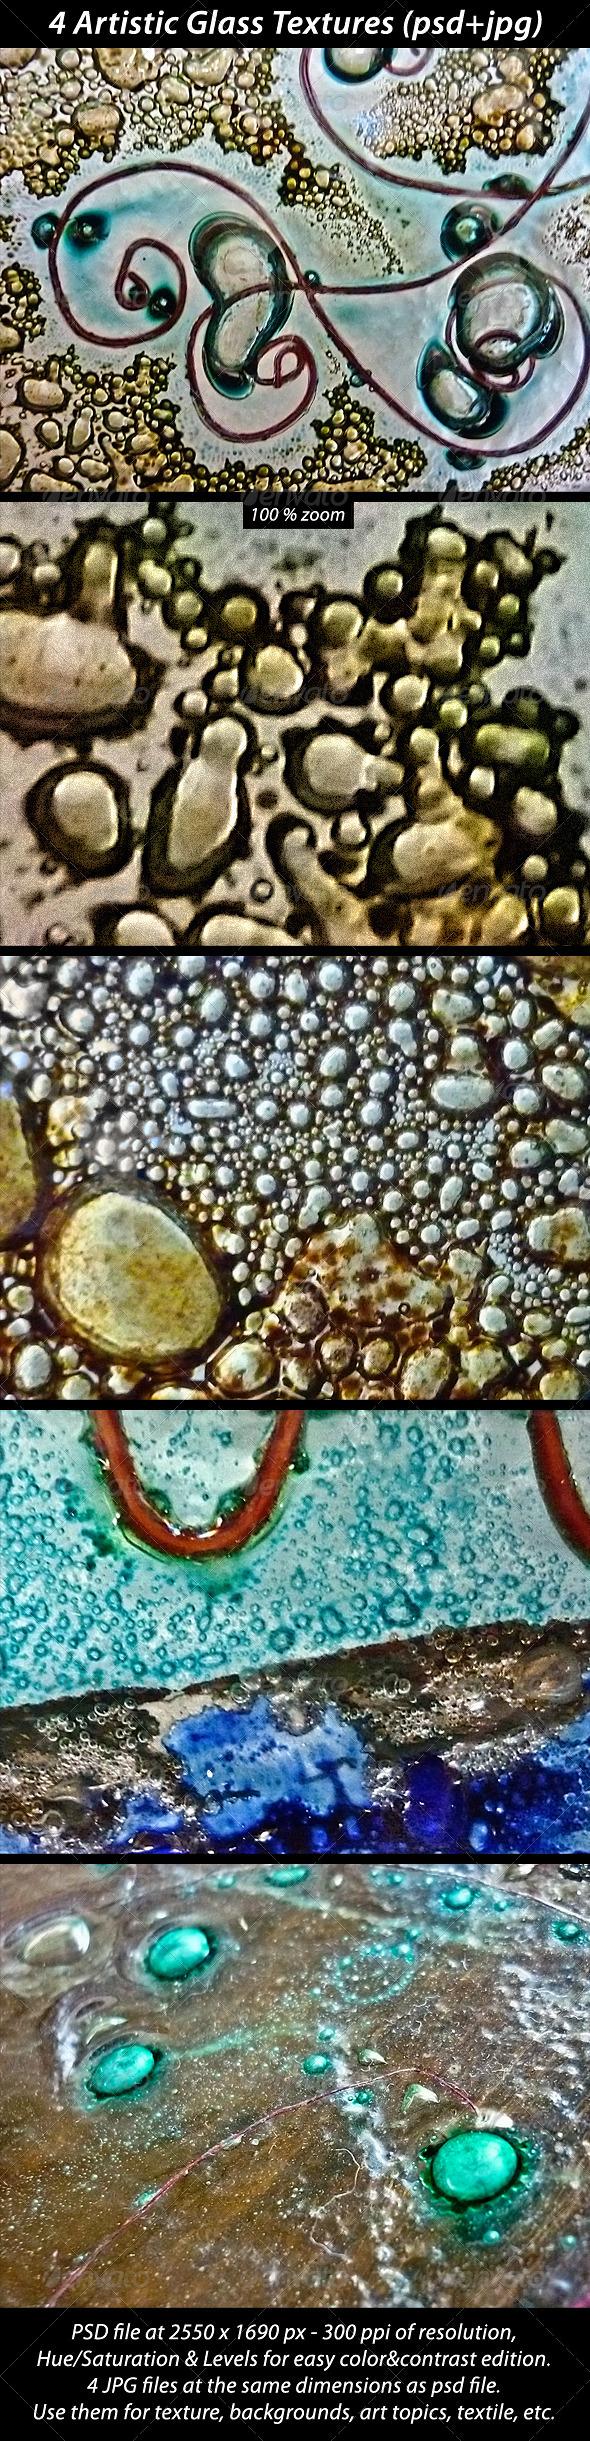 4 Artistic Glass Textures - Art Textures